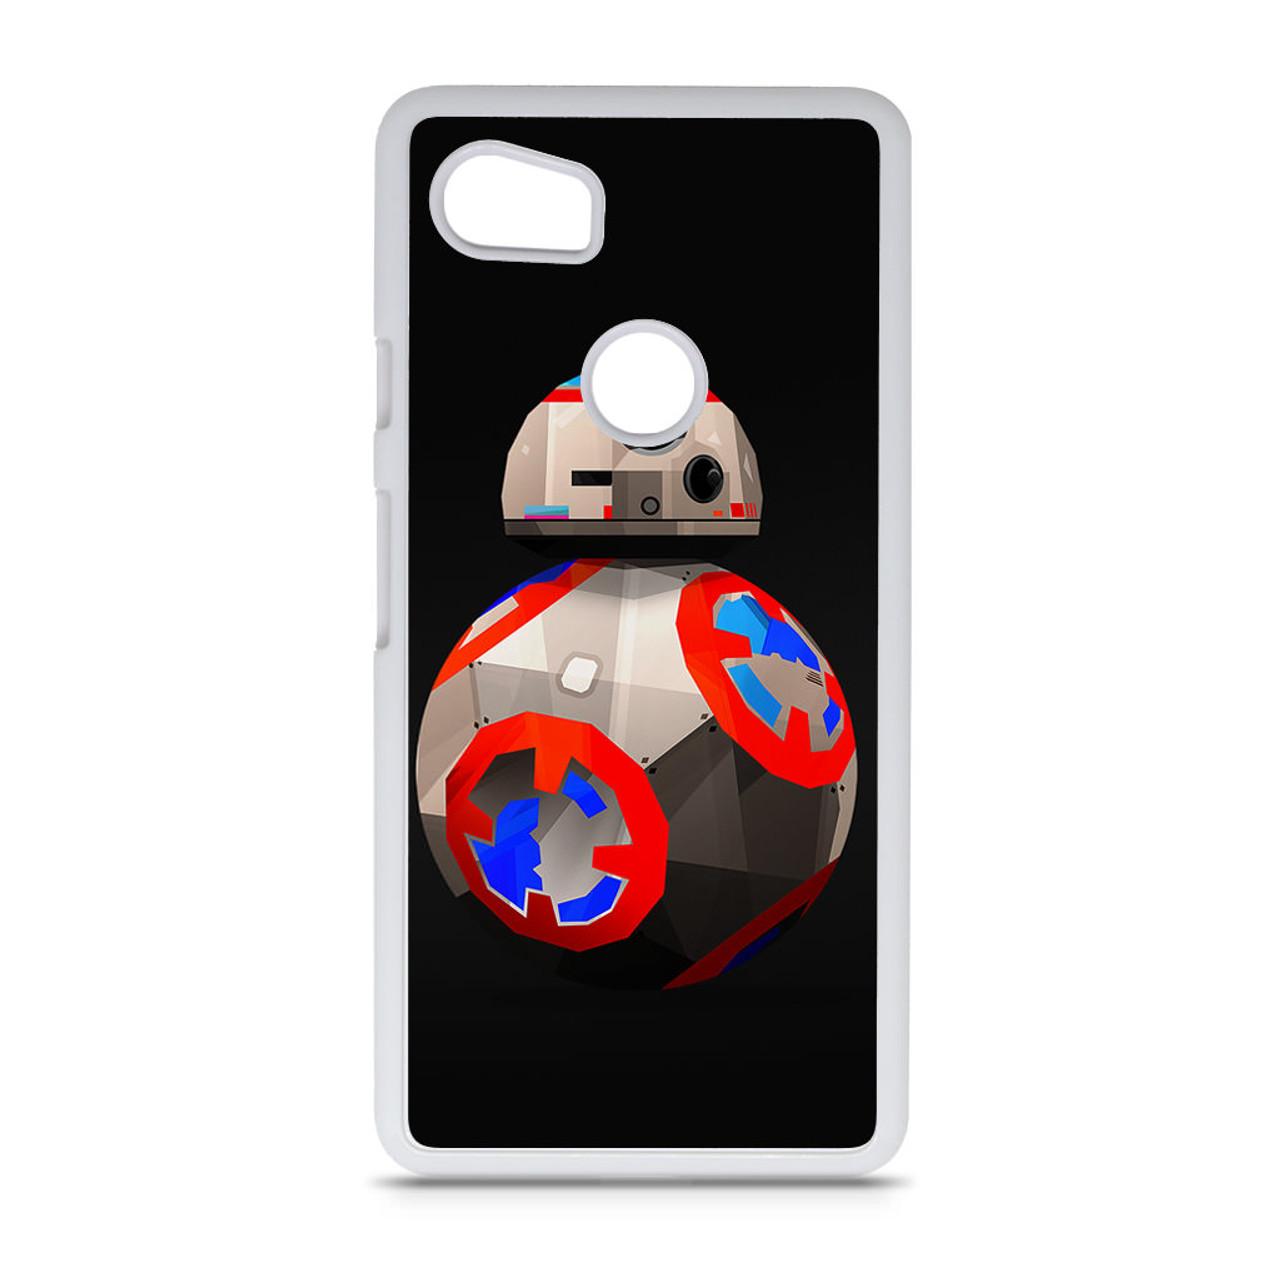 Bb 8 Droid Starwars Robot Art Google Pixel 2 Xl Case